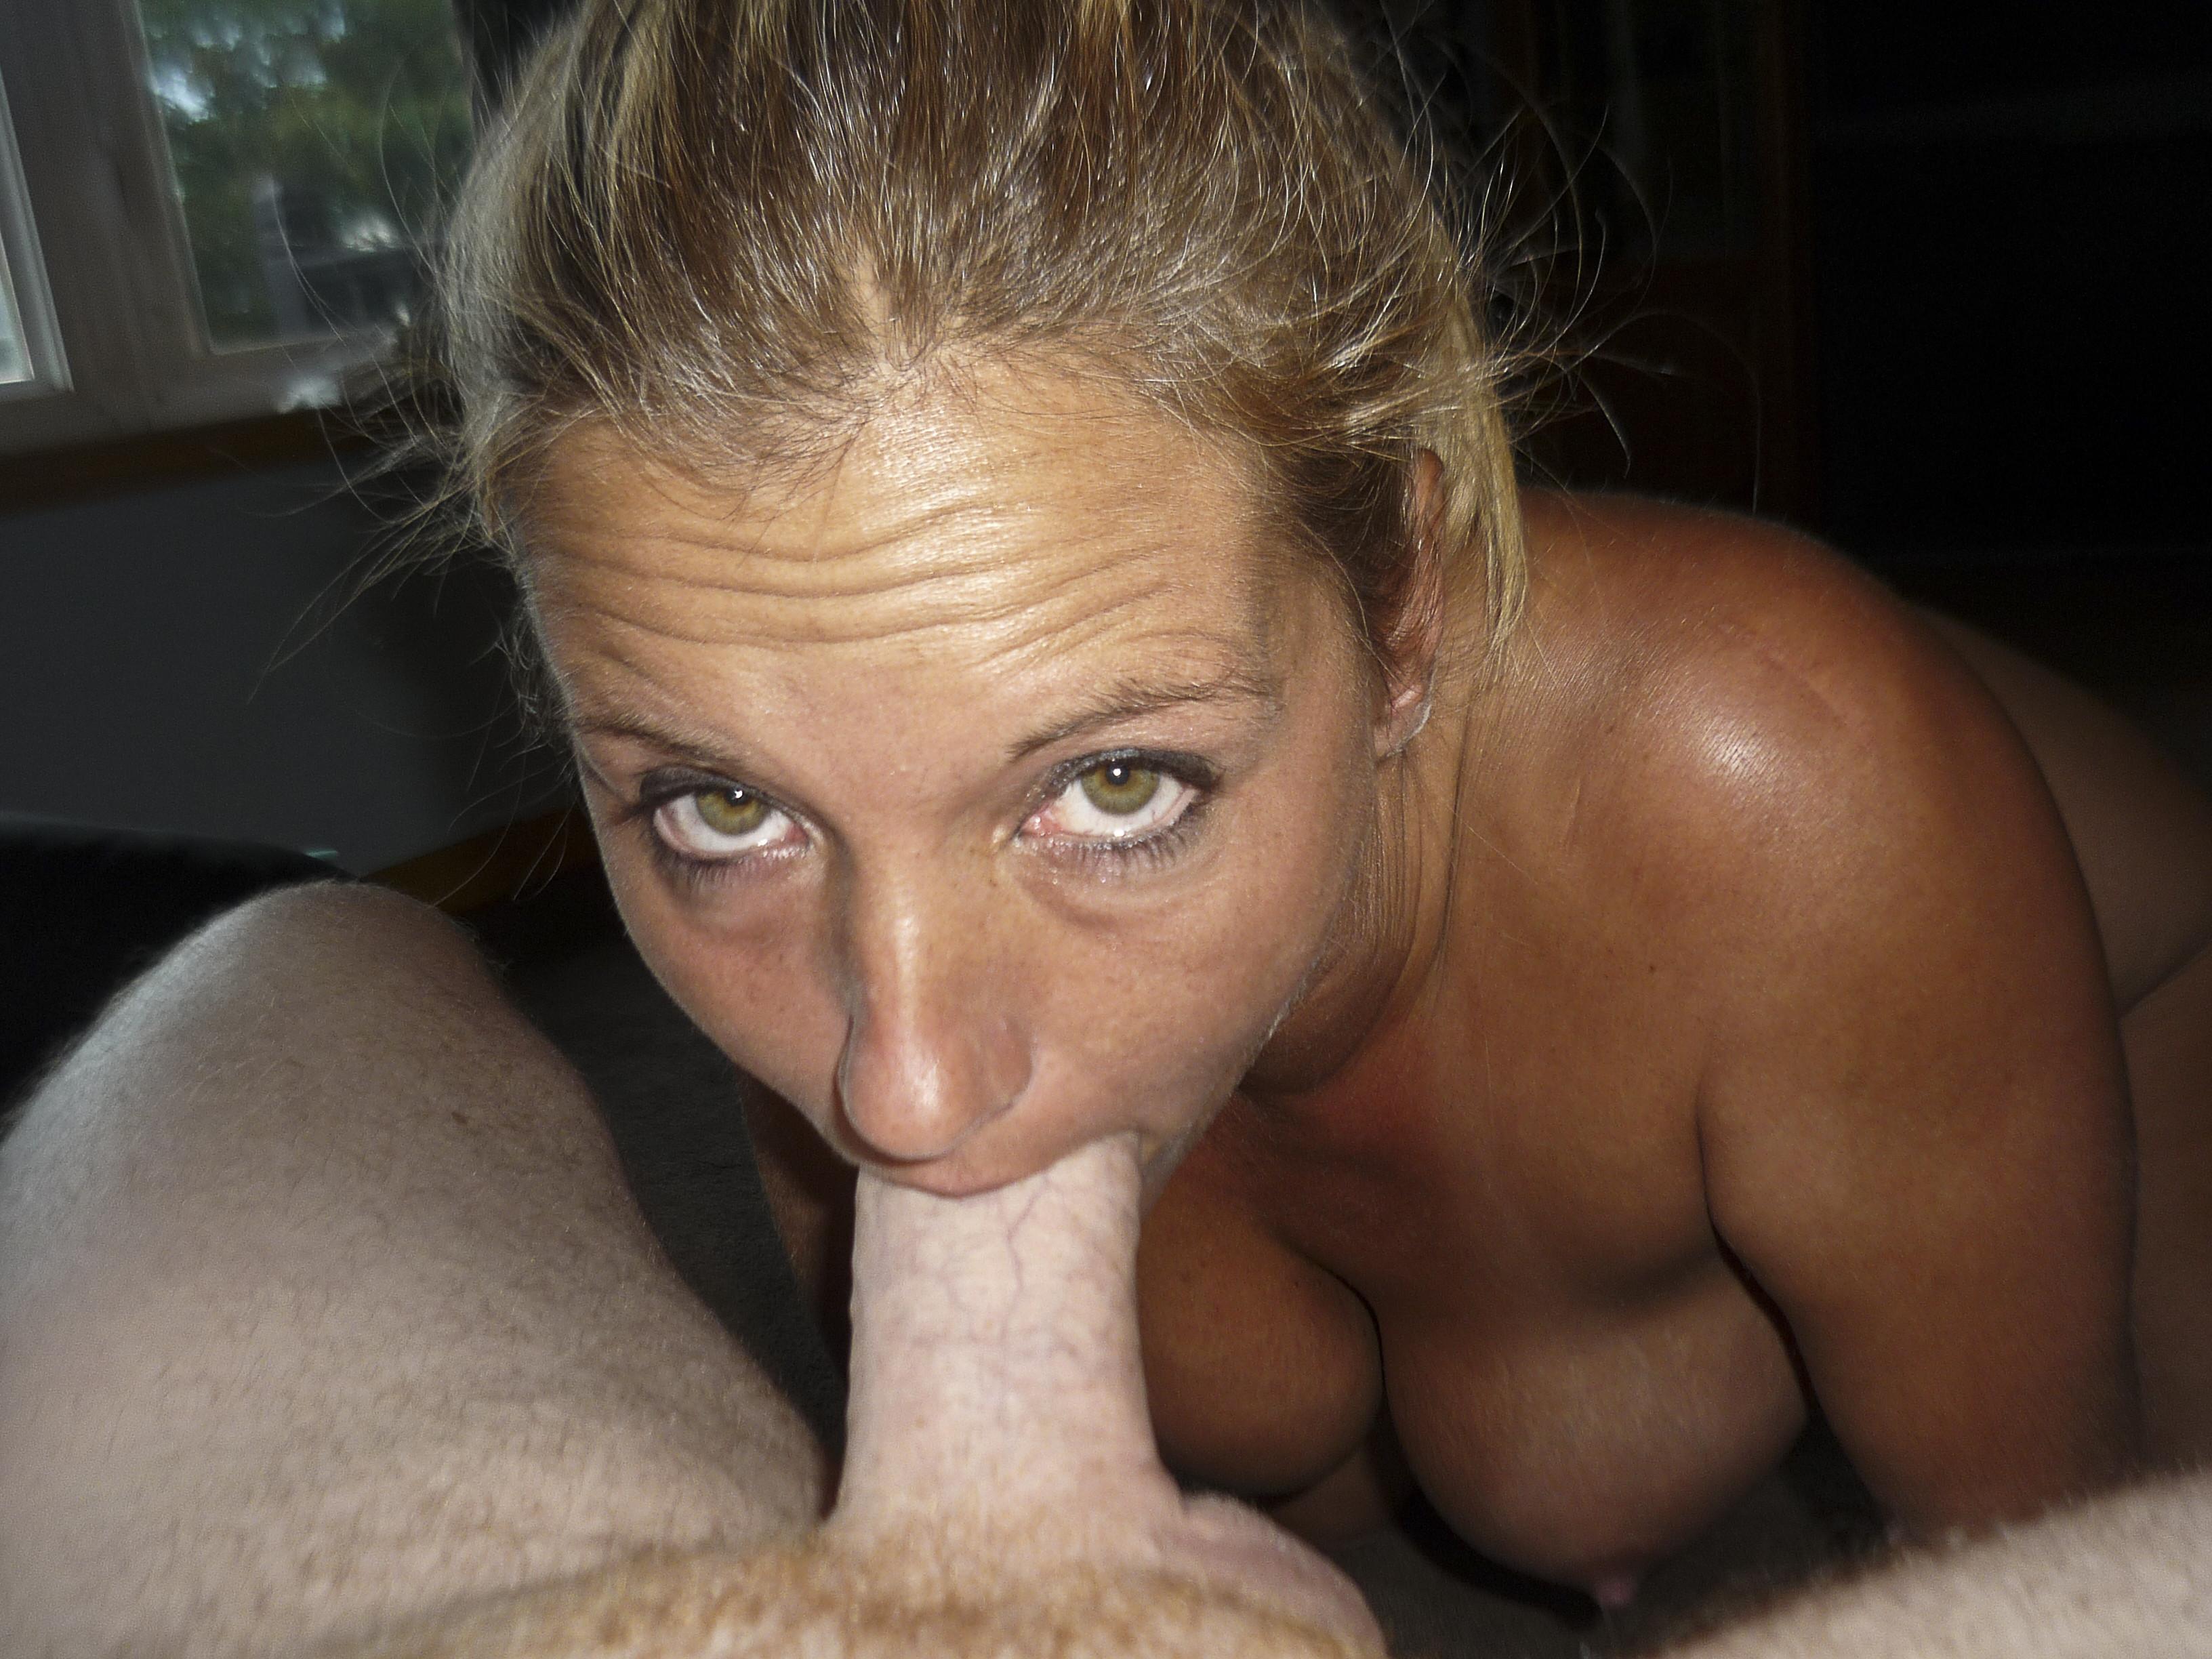 Busty amateur milf pov eye contact blowjob